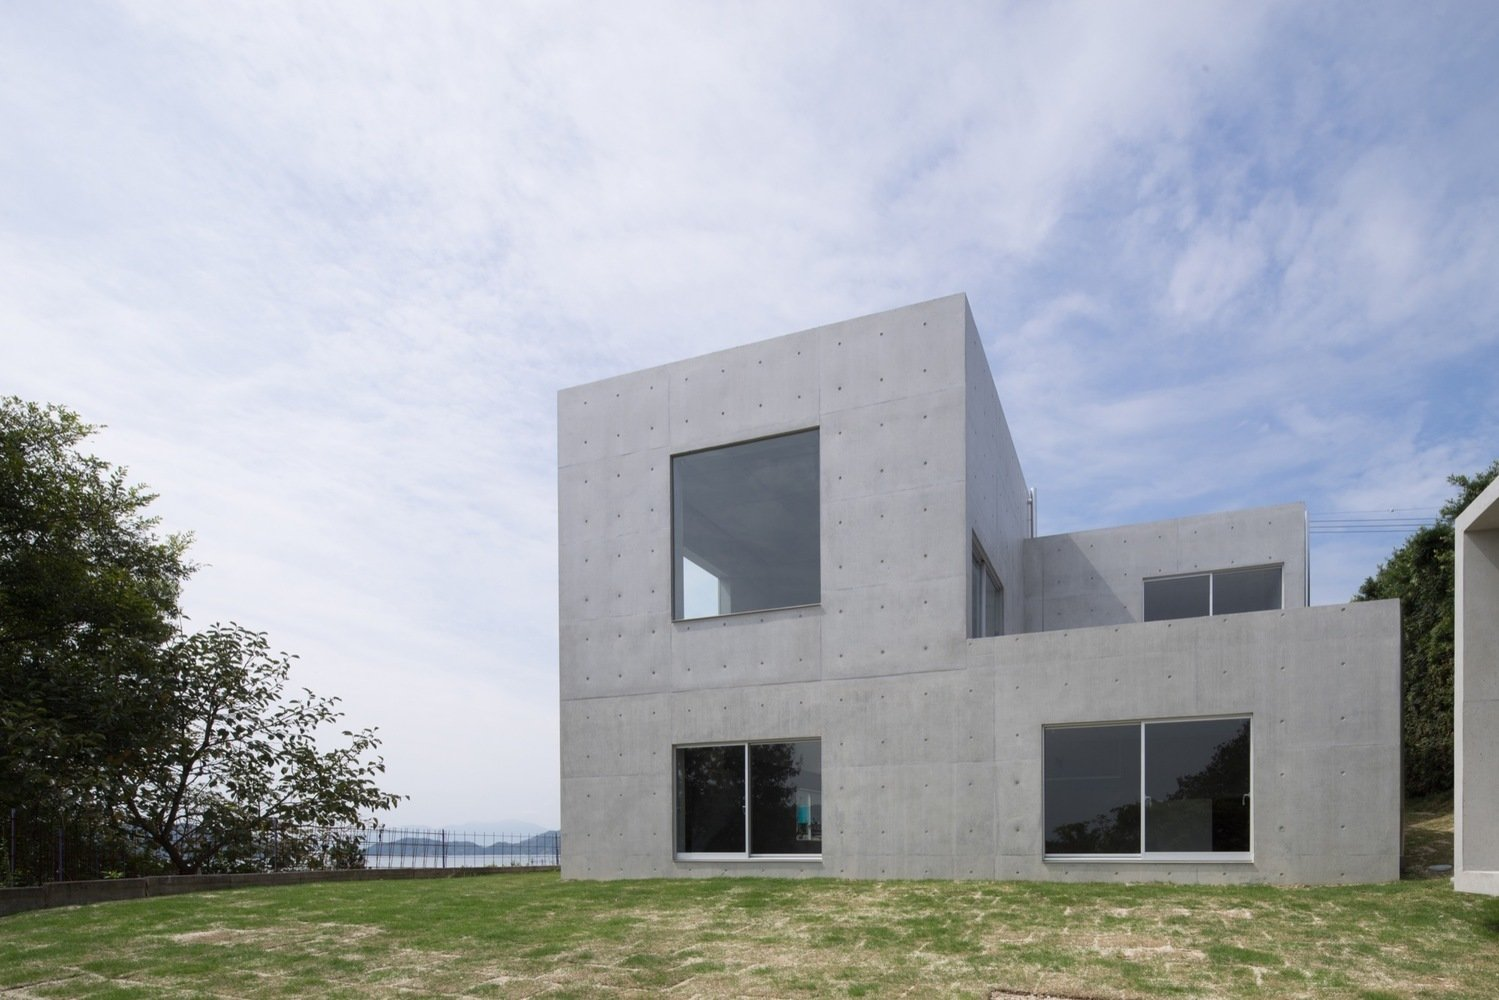 Photo 3 of 6 in House in Akitsu by Kazunori Fujimoto Architect & Associates